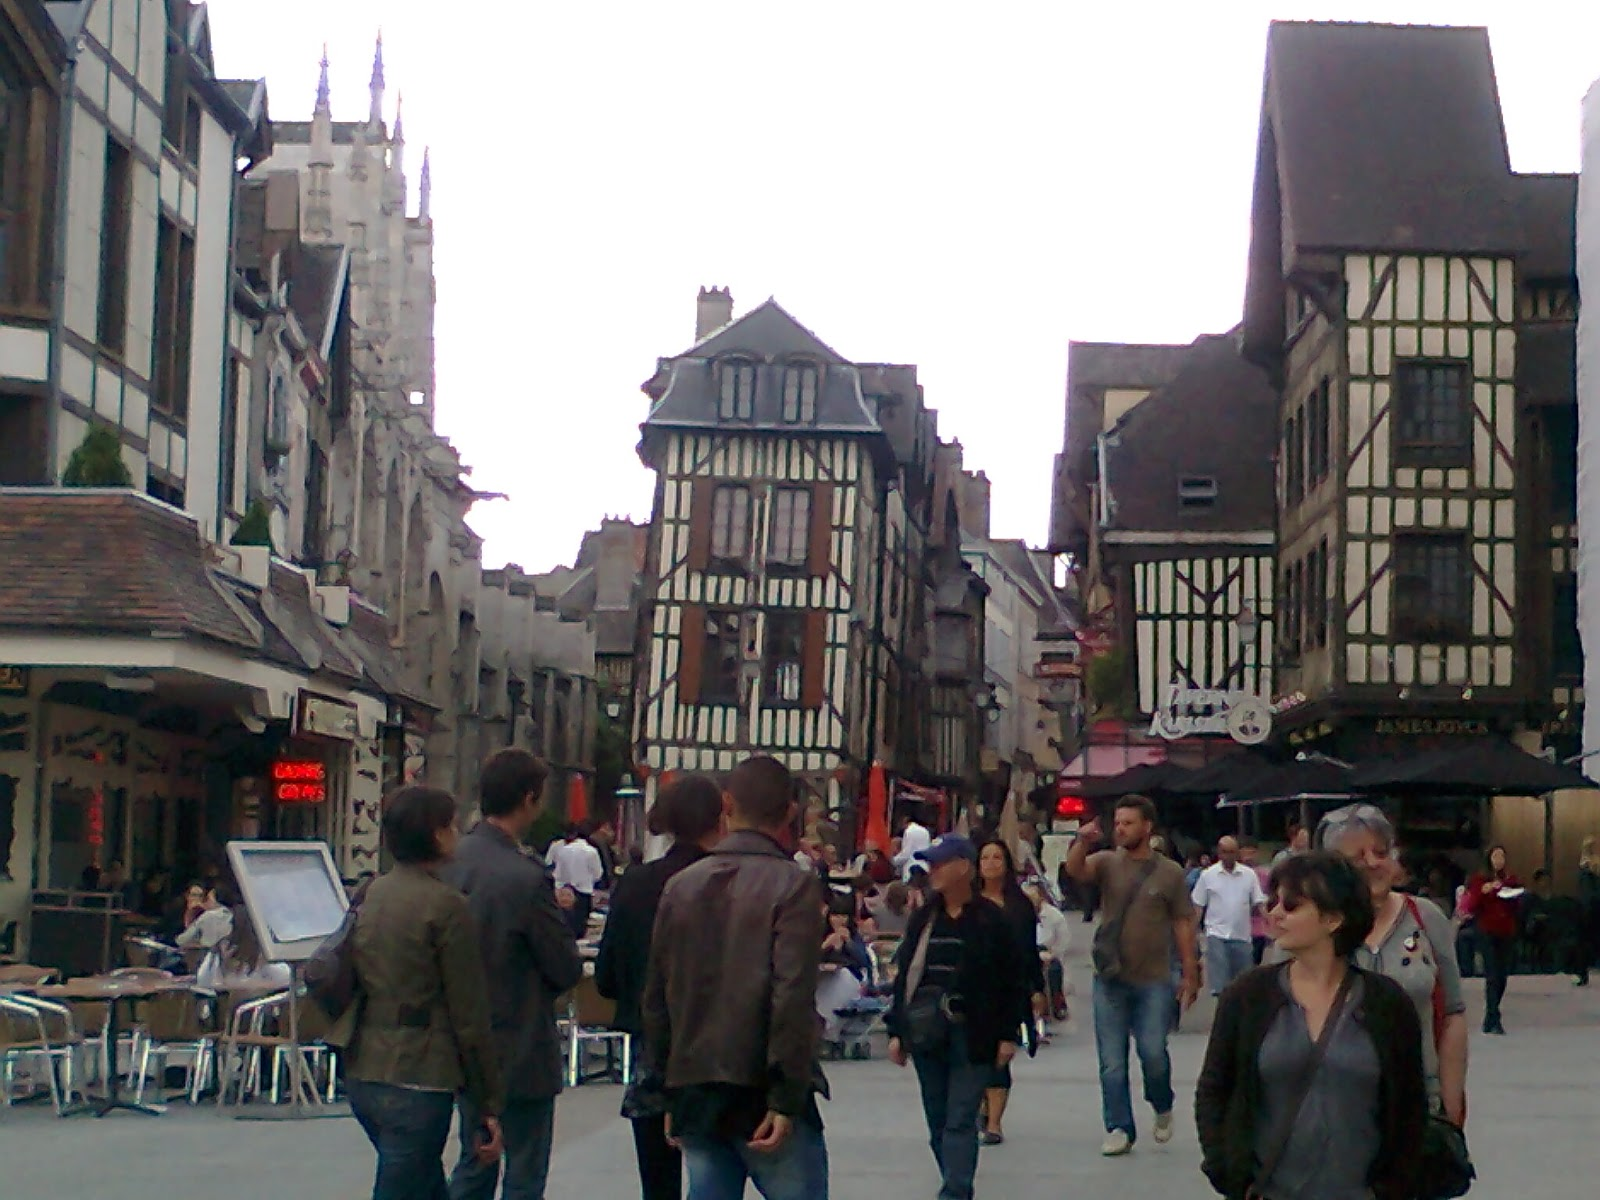 Voyages avec le auros voyage a troyes les magasins d for Troyes magasin d usine soldes